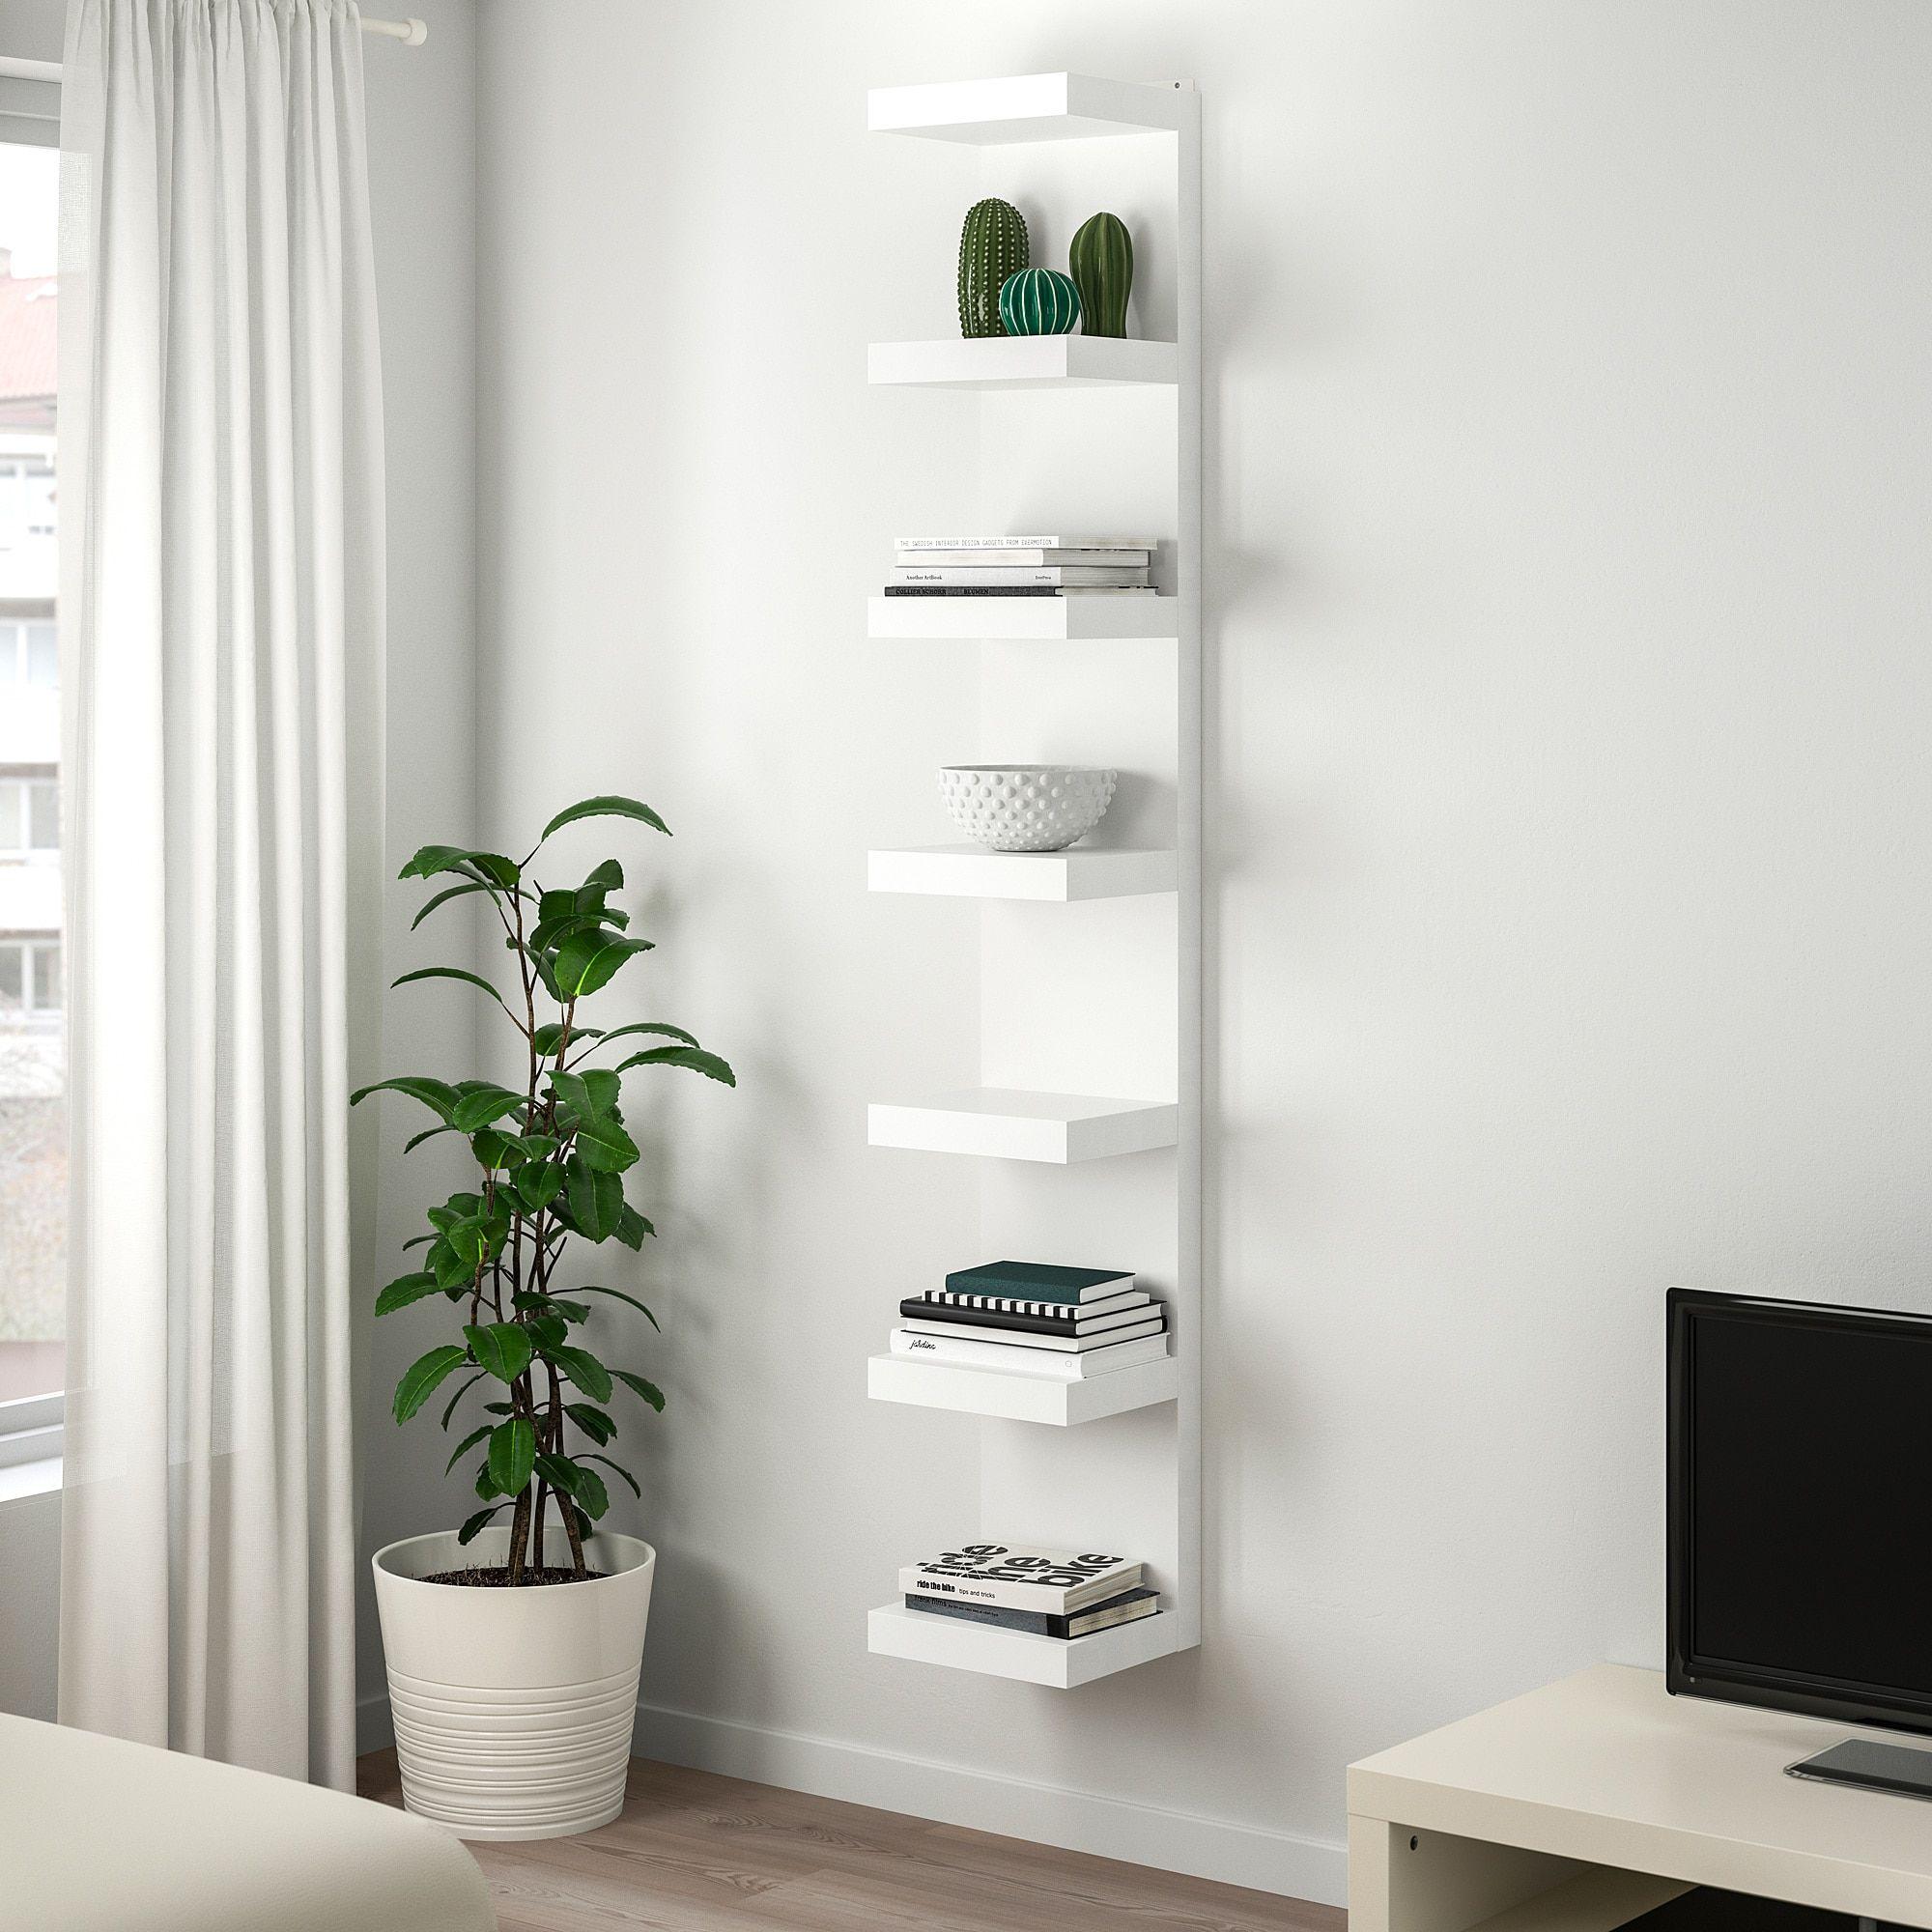 Lack White Wall Shelf Unit Ikea Ikea Lack Wall Shelf Wall Shelf Unit White Wall Shelves